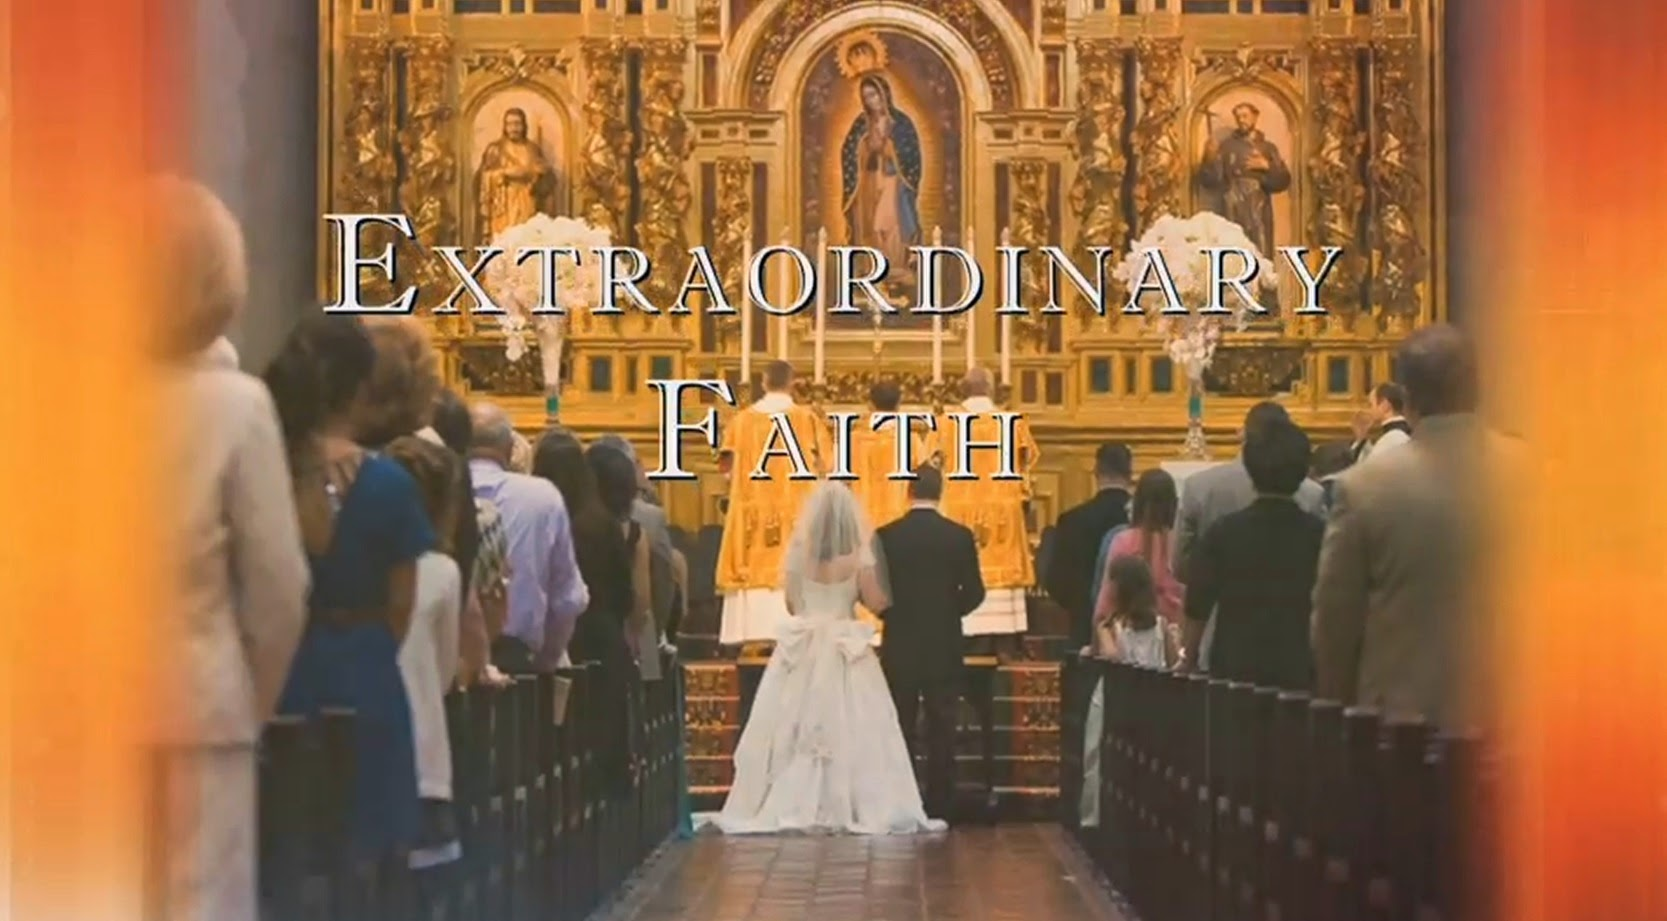 New Liturgical Movement: Extraordinary Faith TV on EWTN - Debut